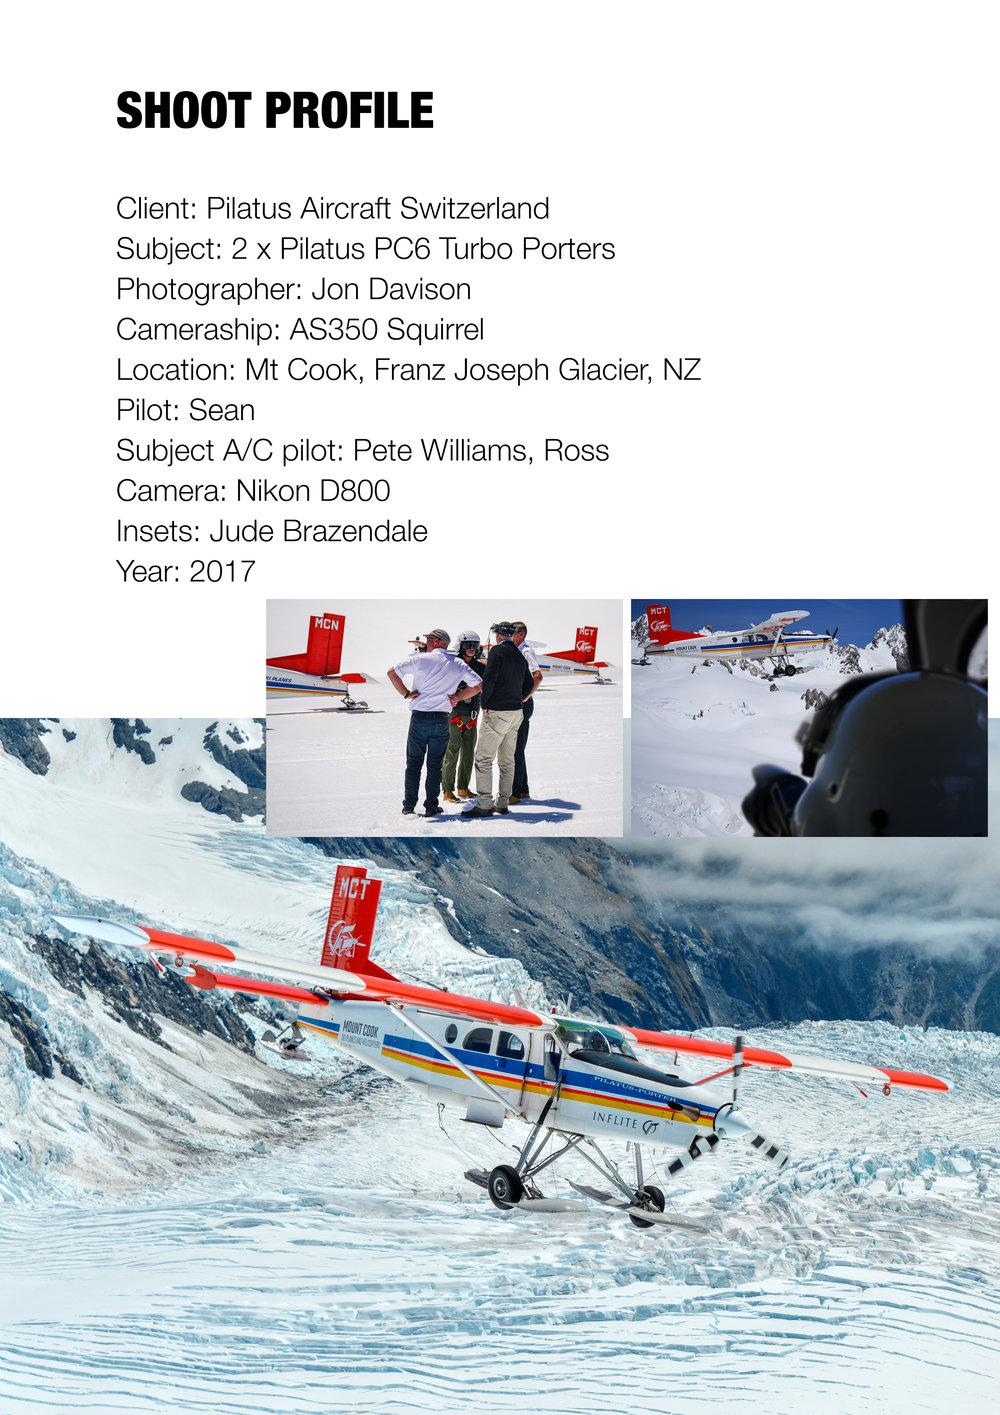 Pilatus PC6, Franz Joseph Glacier, New Zealand